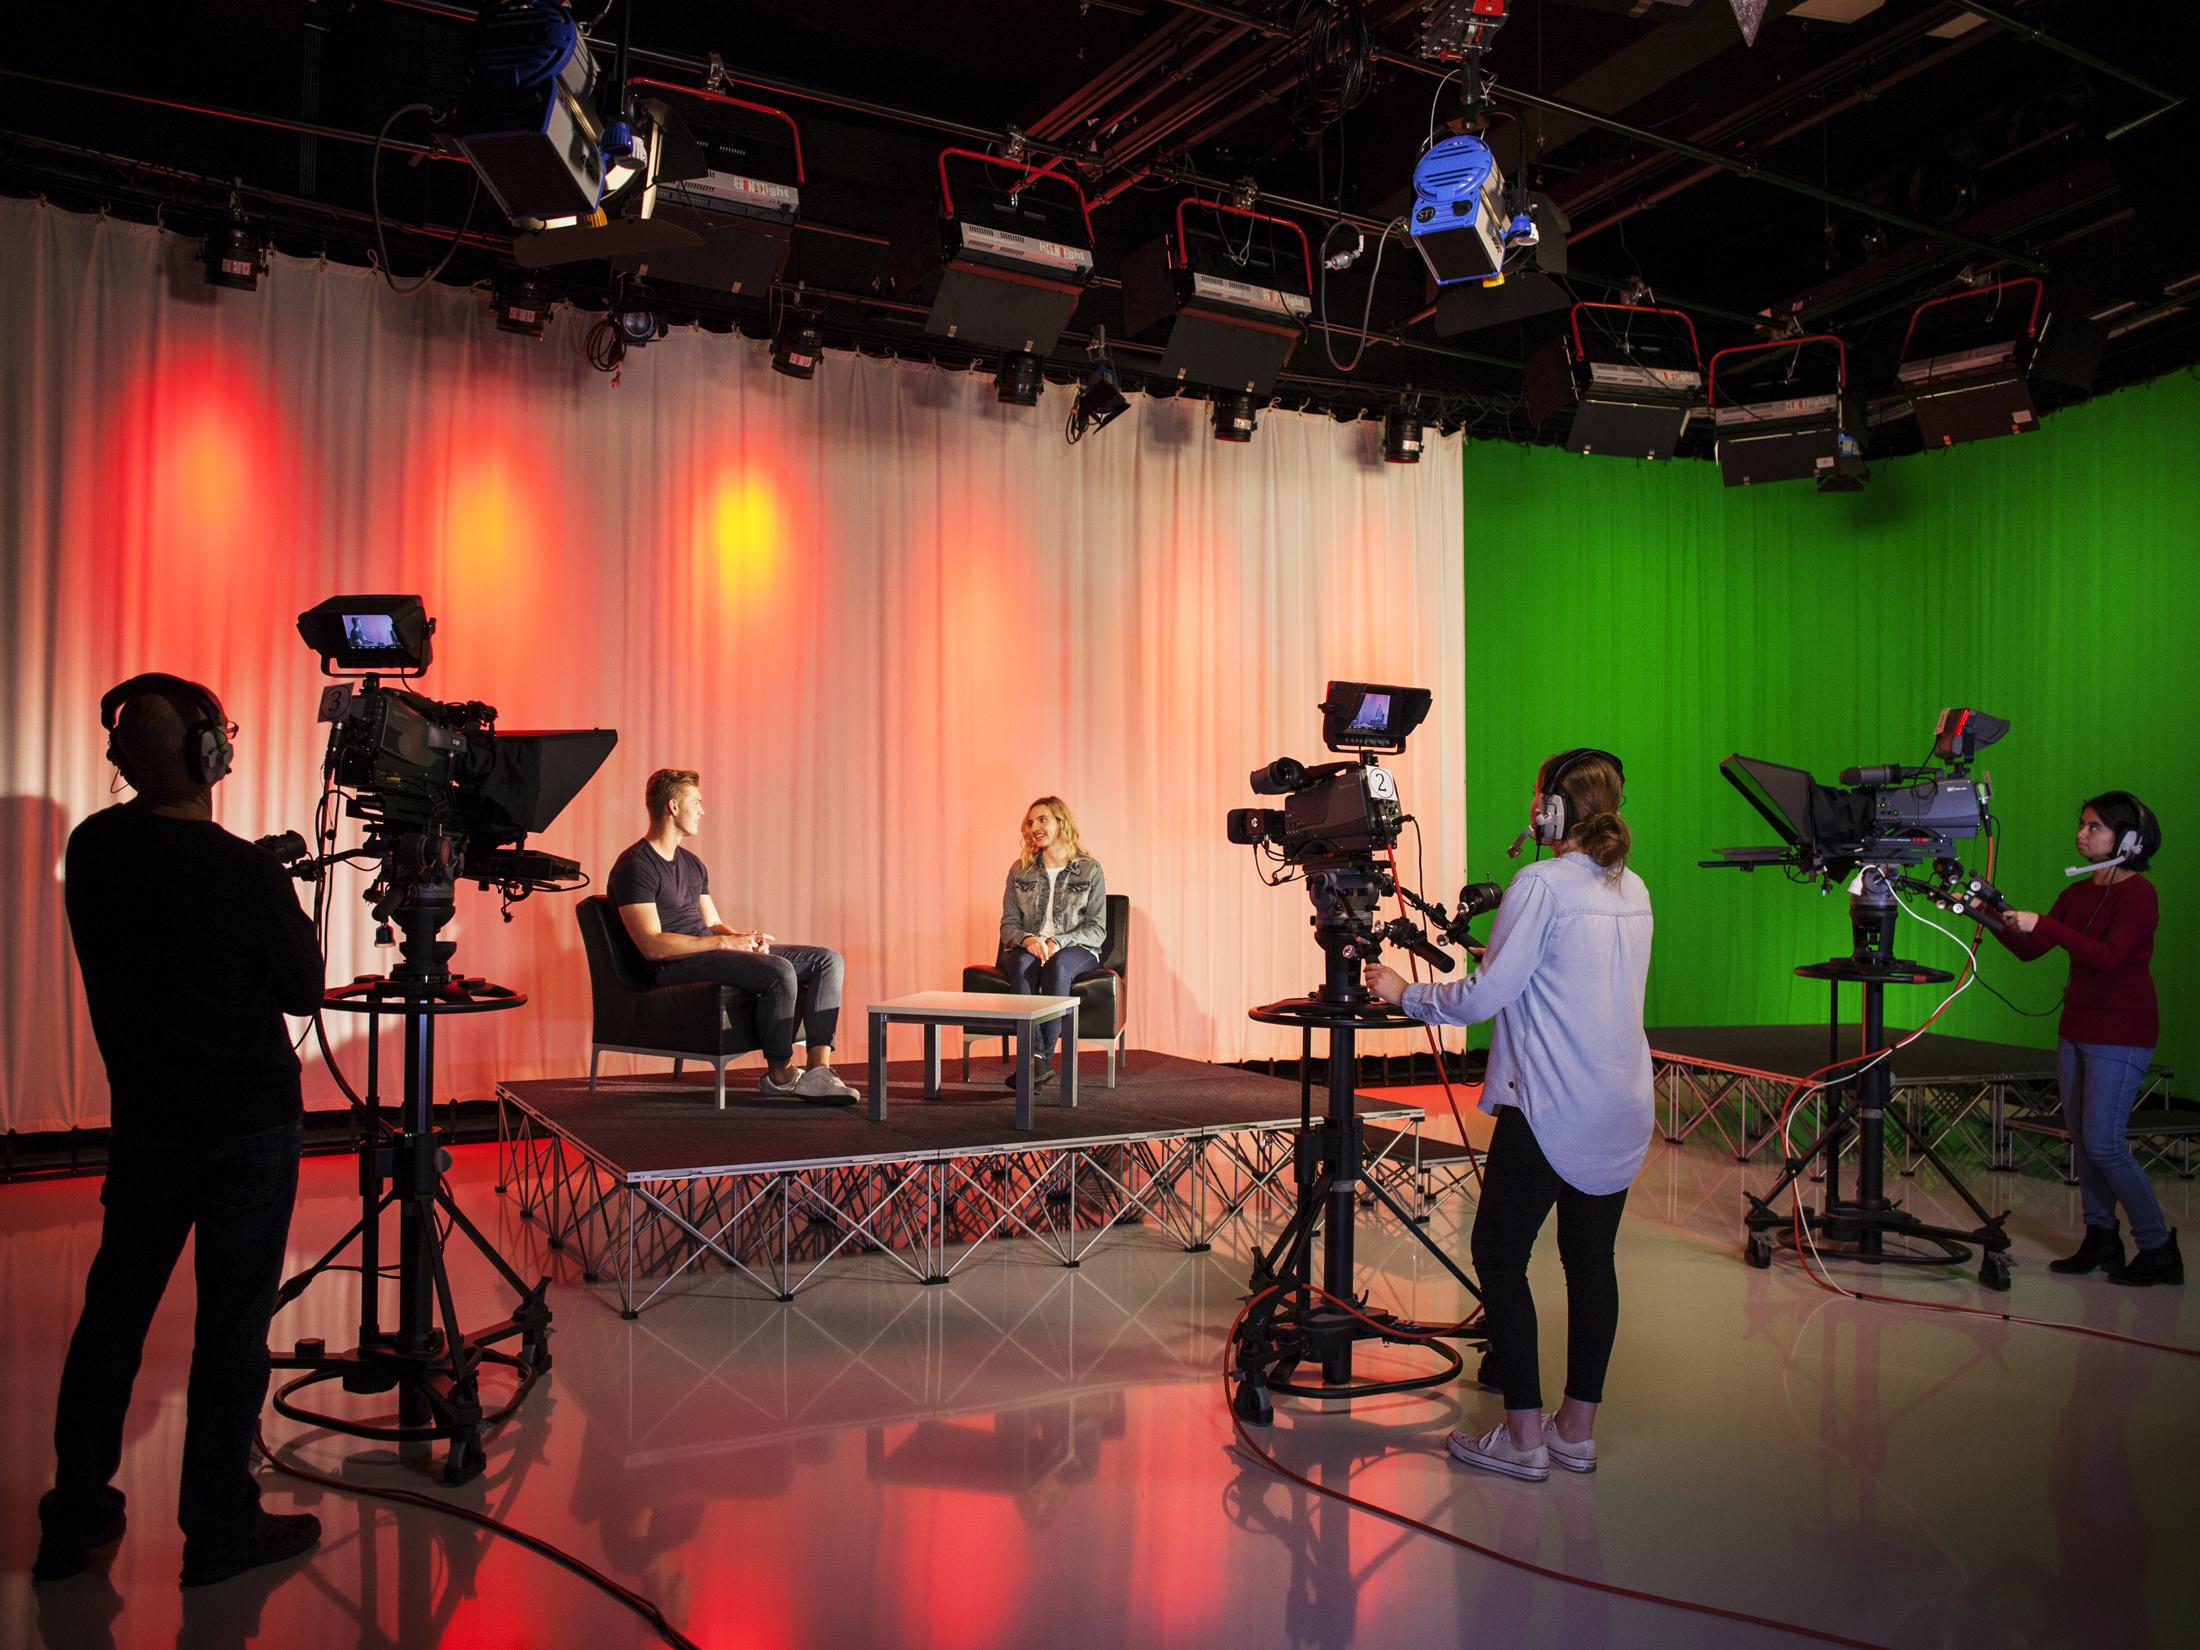 Video Facilities